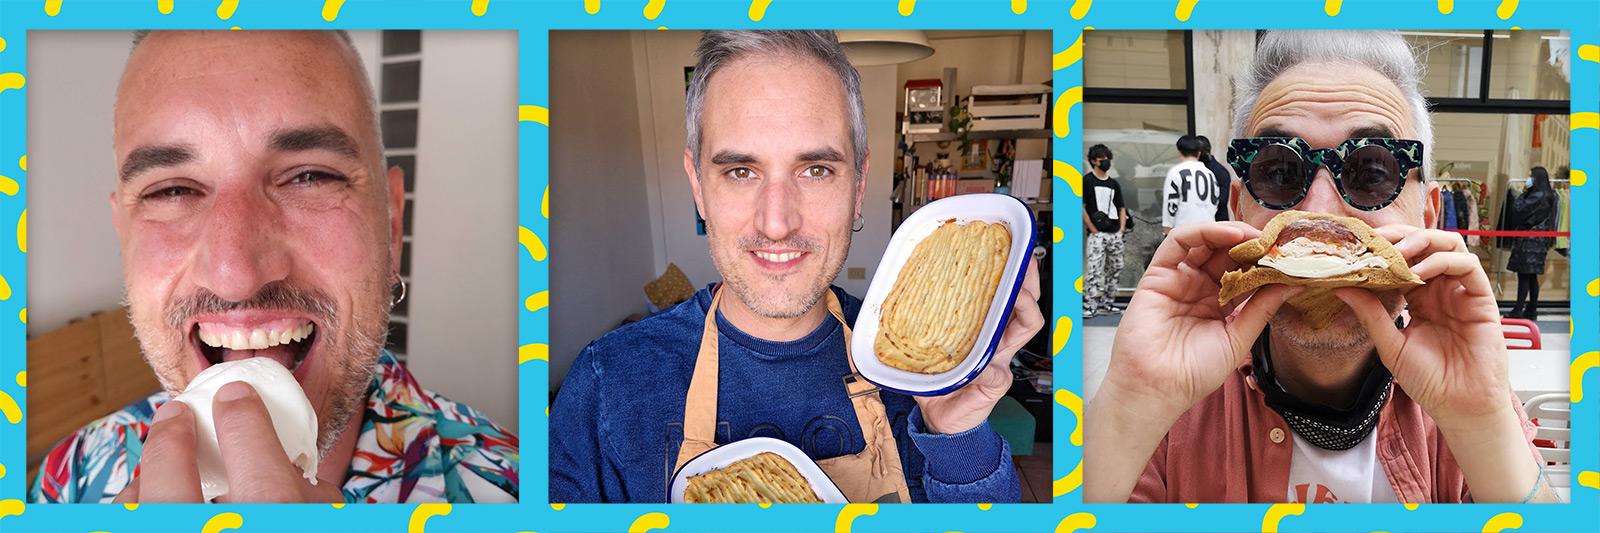 Alessandro Gerbino, Milano, foodblogger blogger di cucina